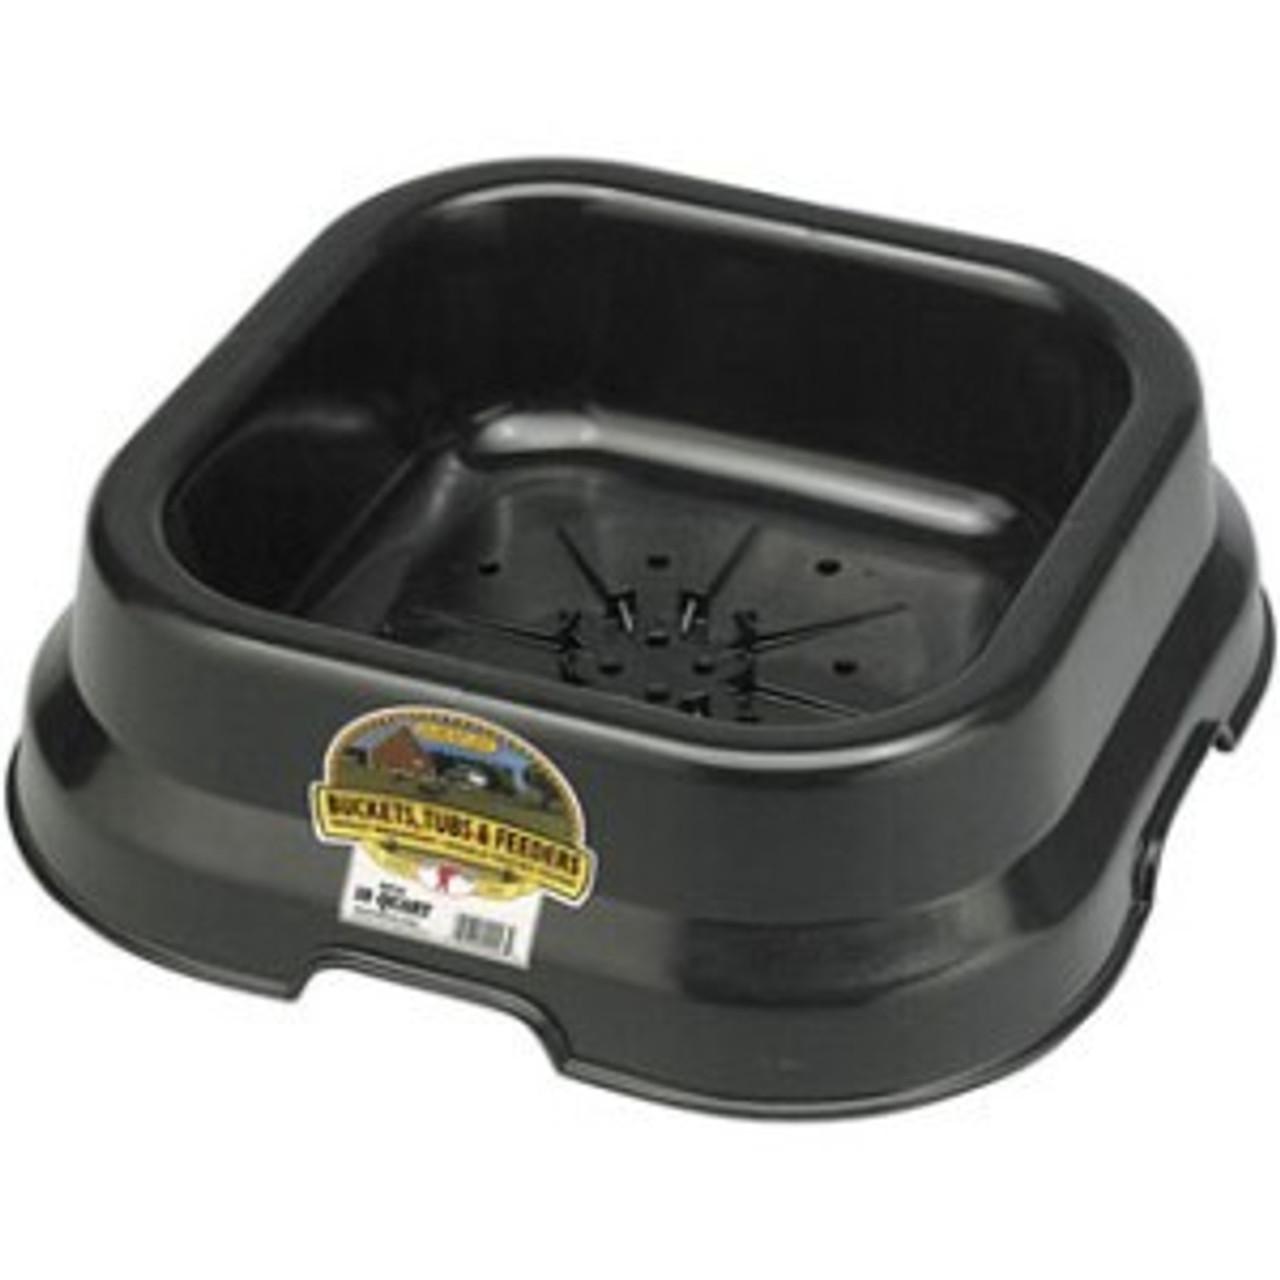 Fortiflex Salt Block Pan Black